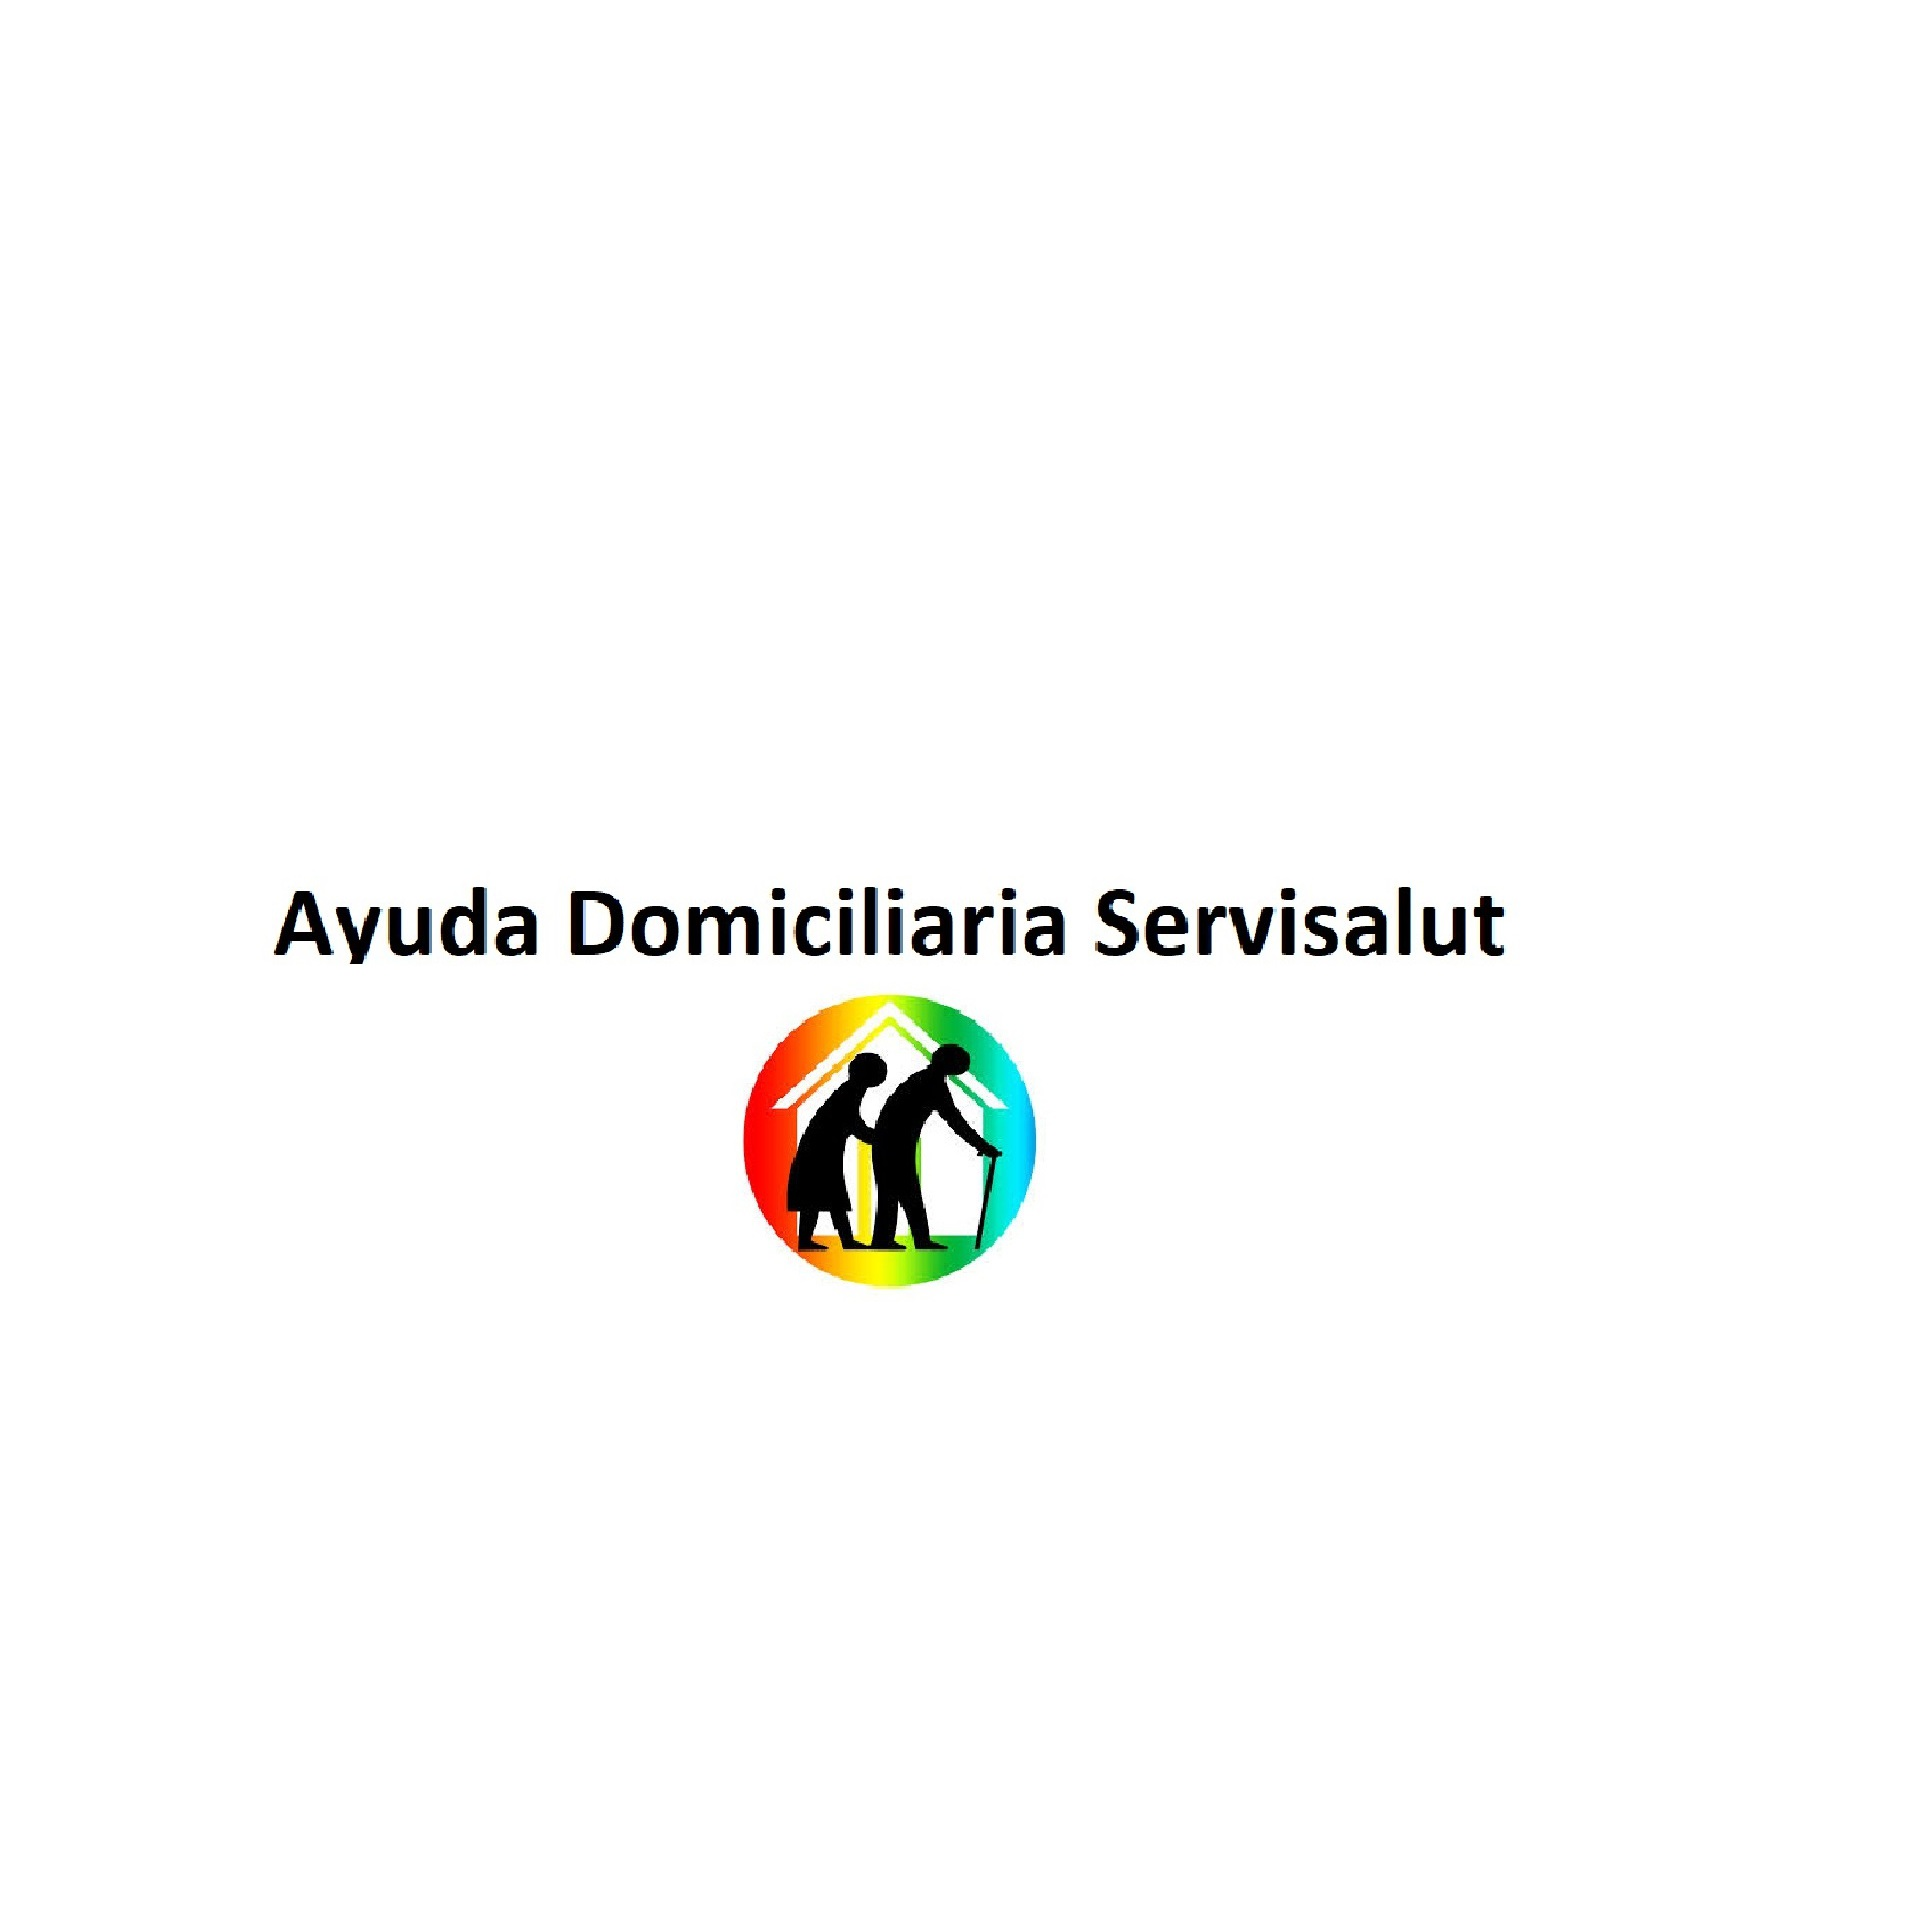 Ayuda Domiciliaria Barcelona Servisalut